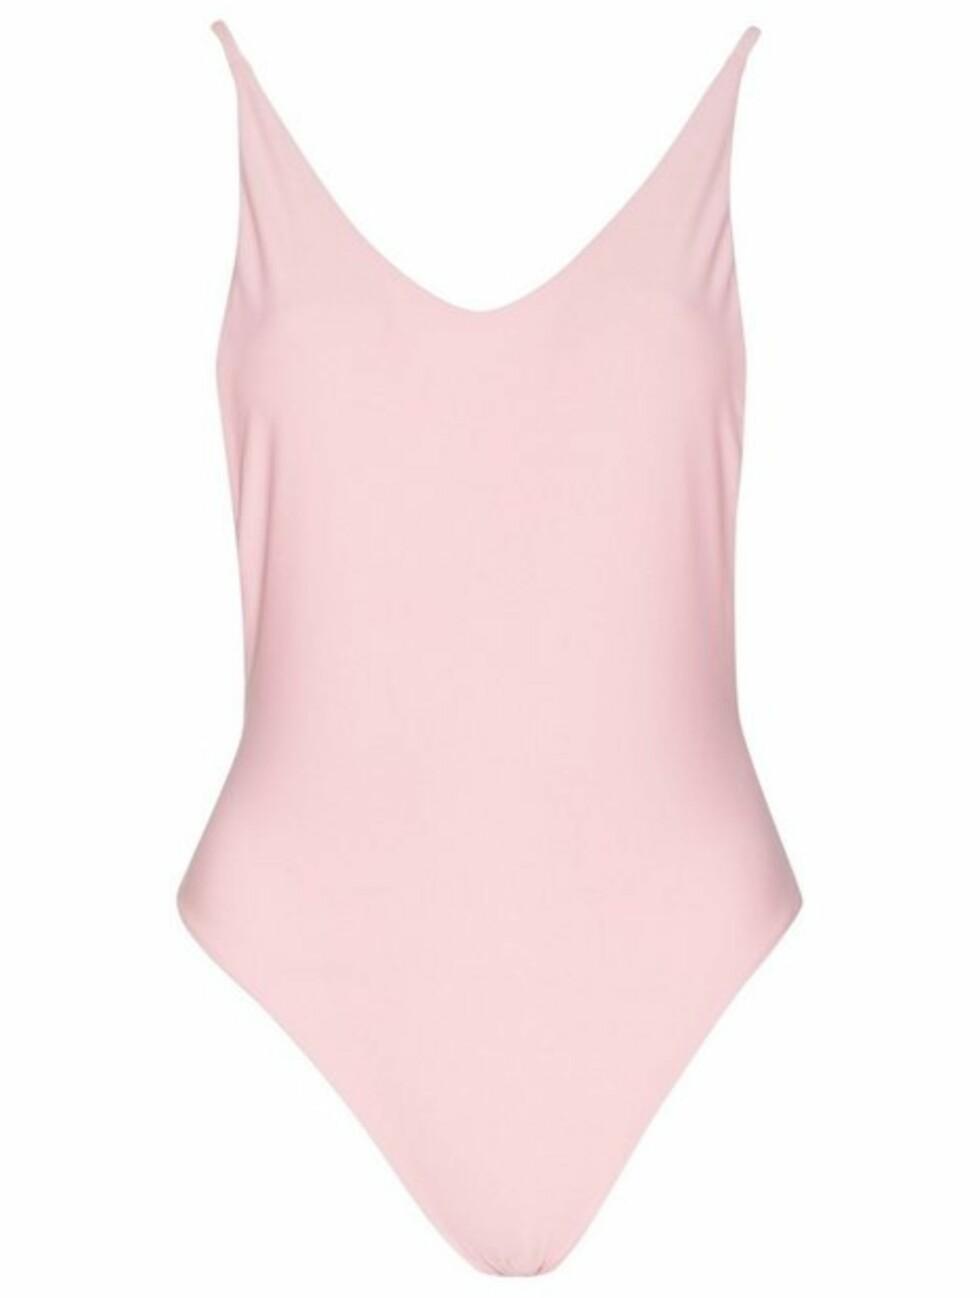 Badedrakt fra Elsa & Rose |599,-| https://nelly.com/no/kl%C3%A6r-til-kvinner/badet%C3%B8y/badedrakter/elsa-rose-201471/brigette-swimsuit-321897-0987/